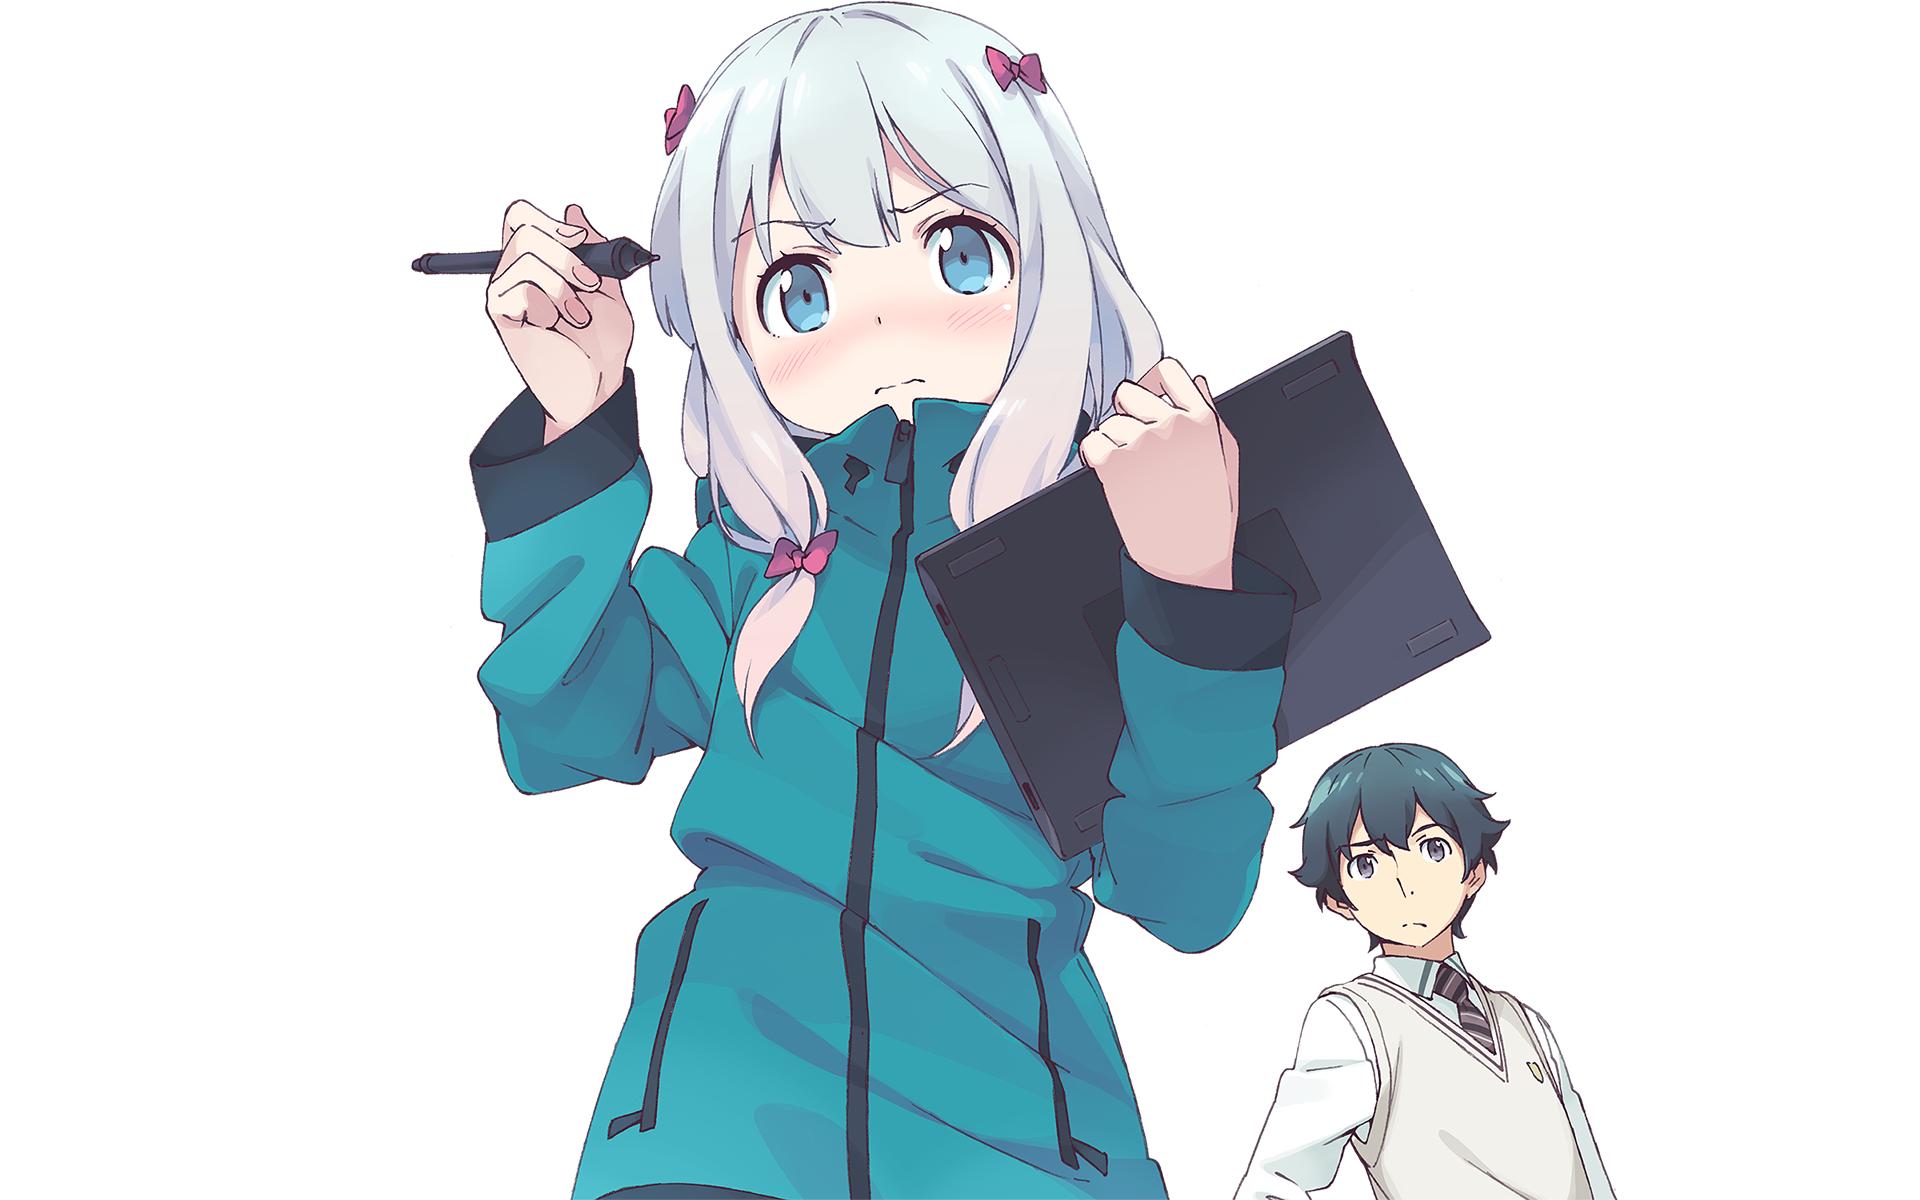 Anime - EroManga-Sensei Sagiri Izumi Masamune Izumi Bakgrund - Anime HD PNG